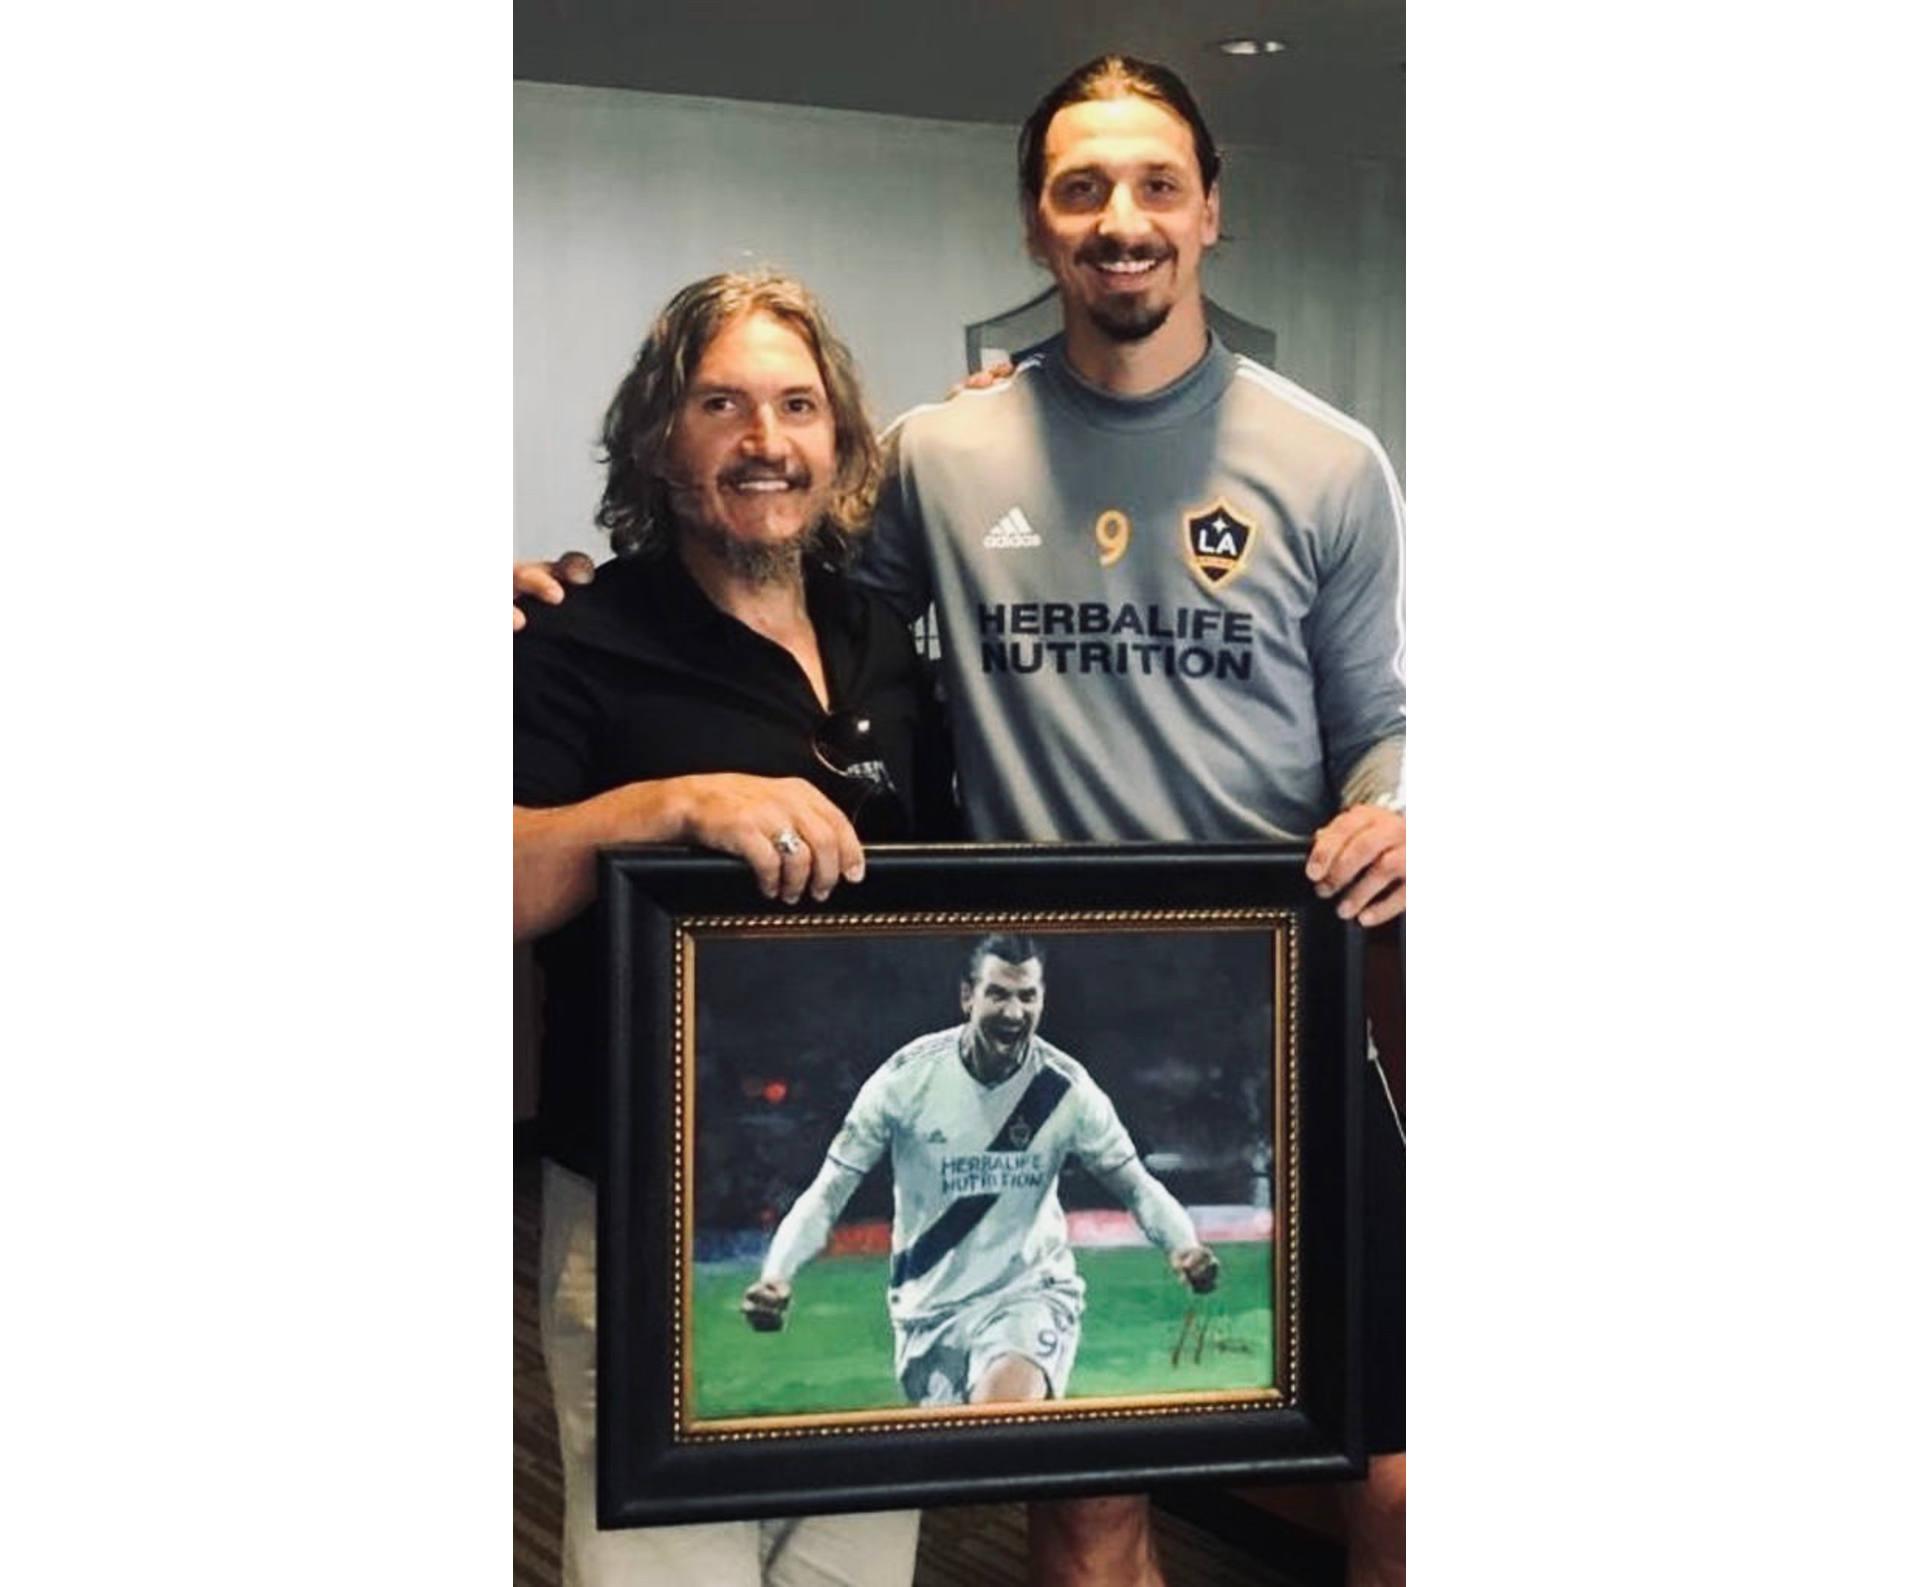 Zlatn Ibrahimović holding portrait next to painter Fabian Perez